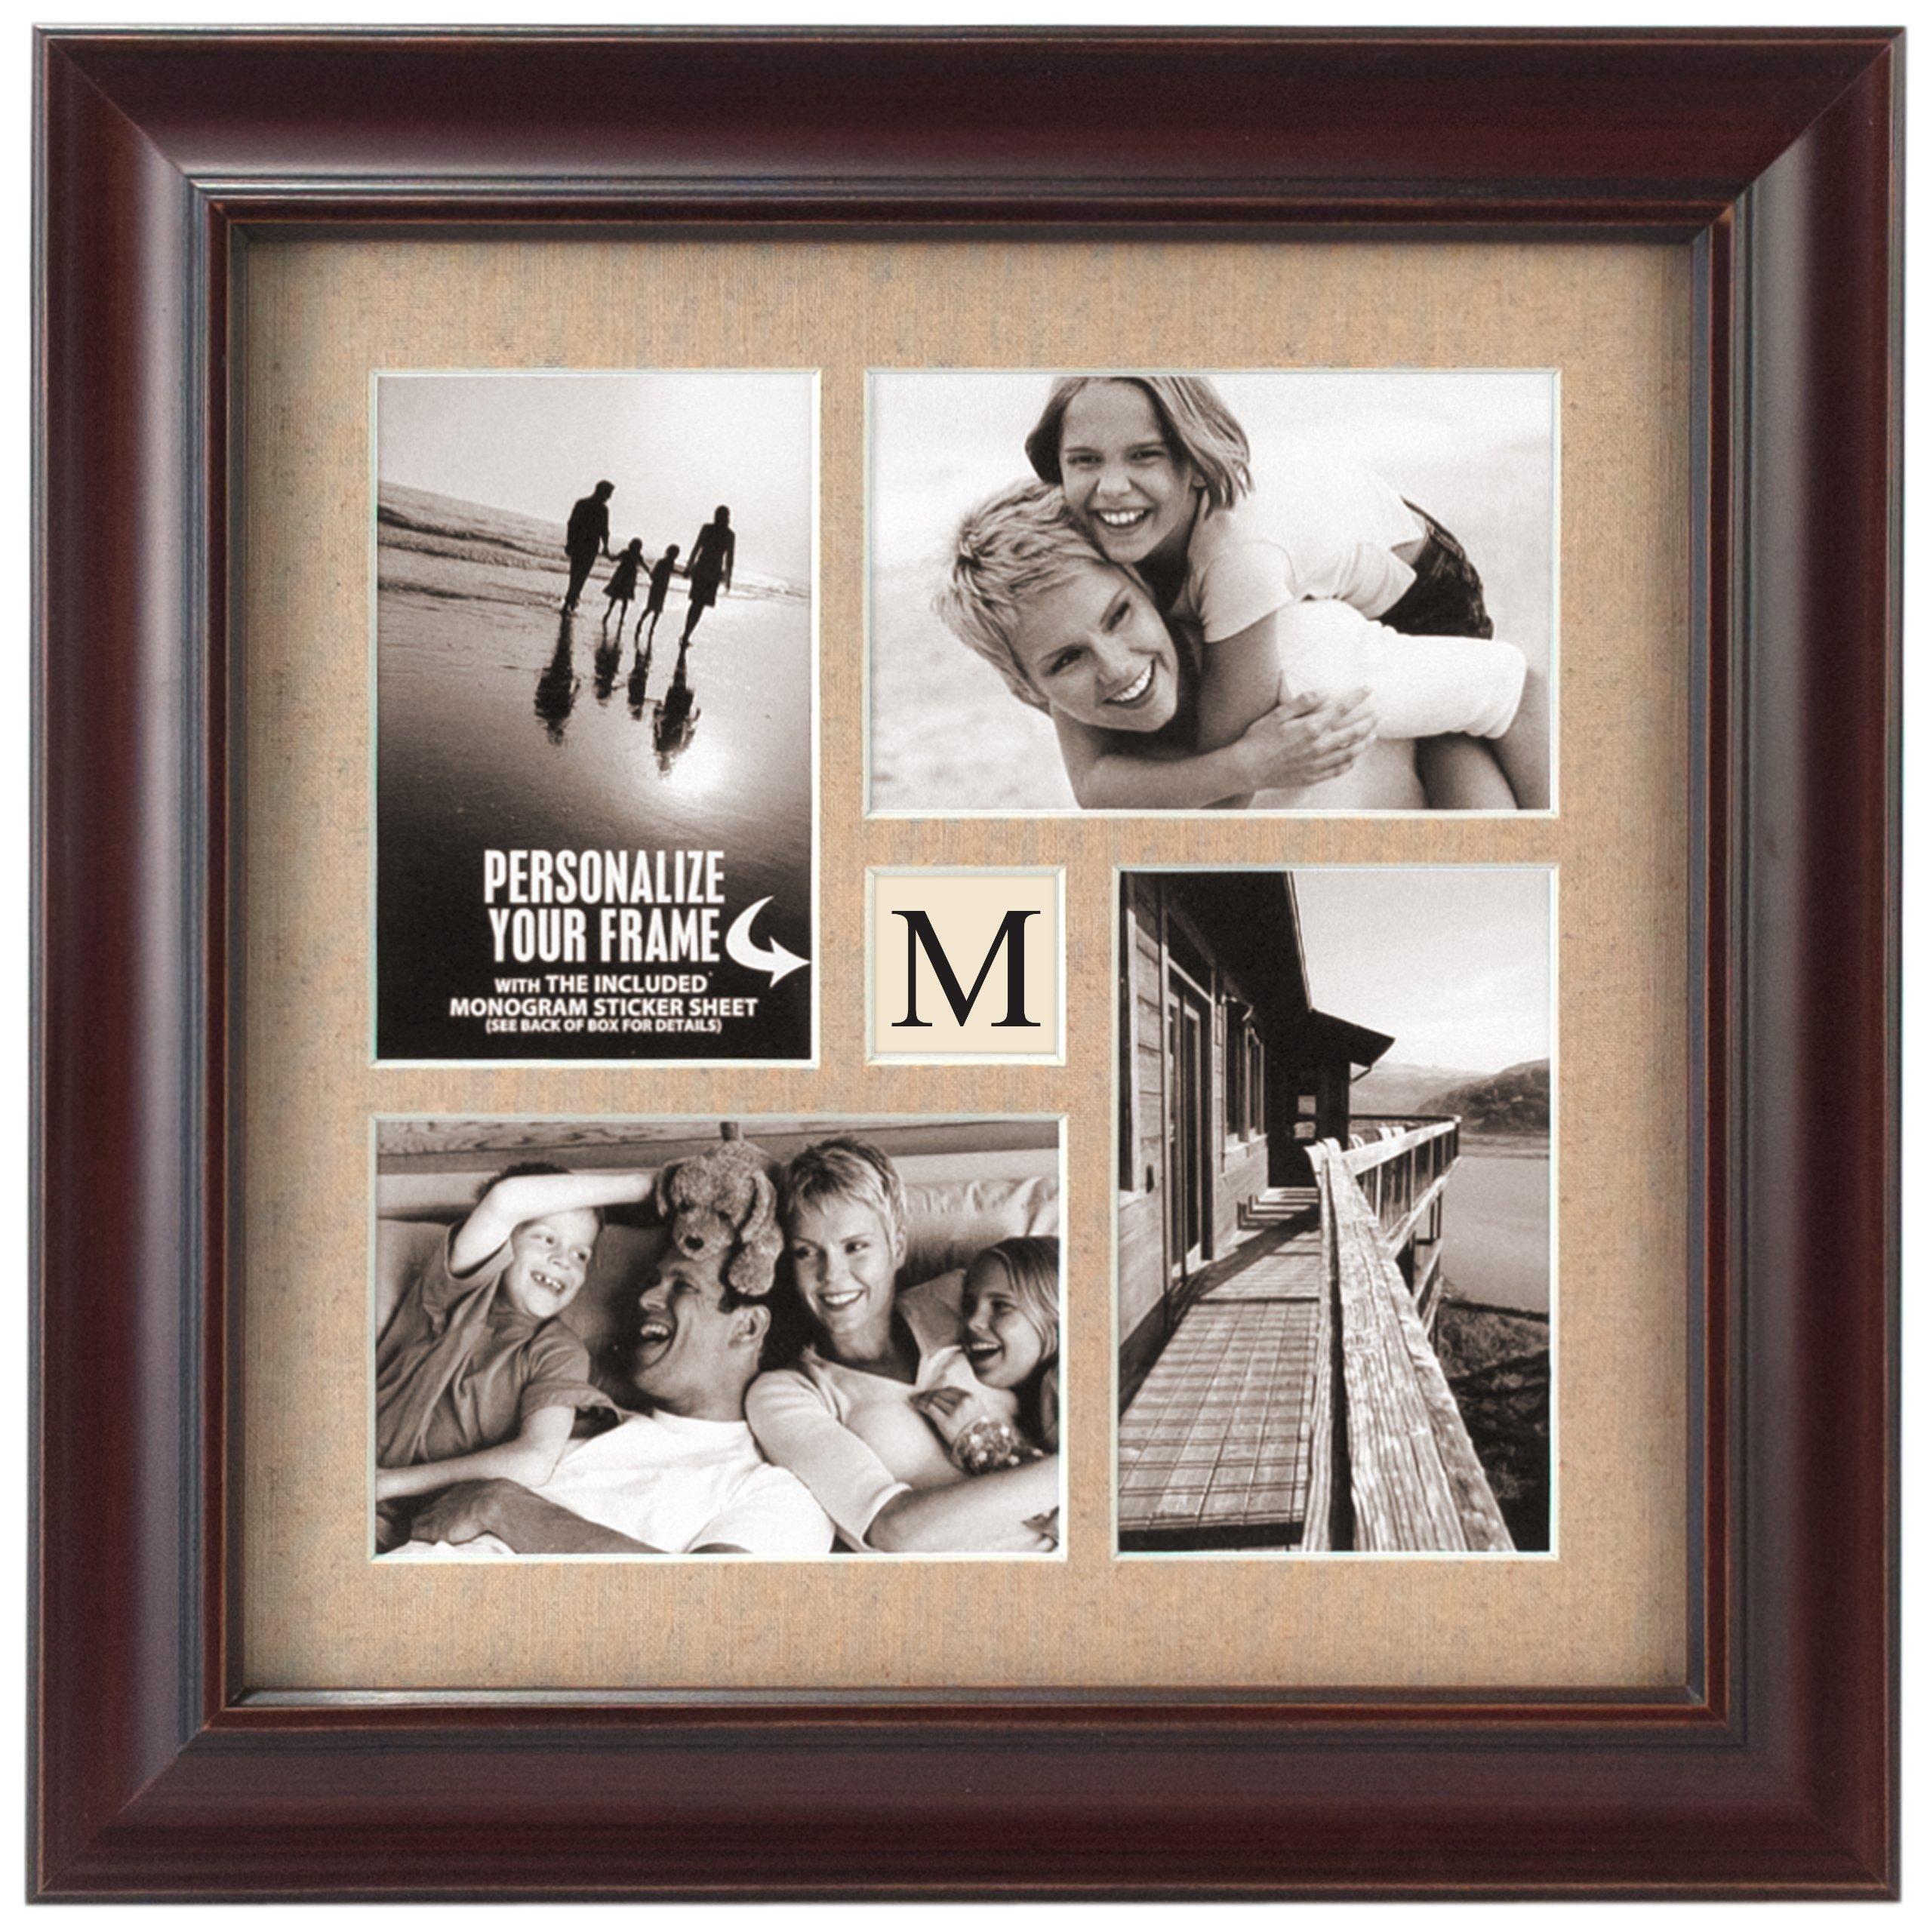 Malden International Designs Barnside Portrait Gallery Personalized Textured Mat Picture Frame, 4 Option, 4-4x6, Walnut by Malden International Designs